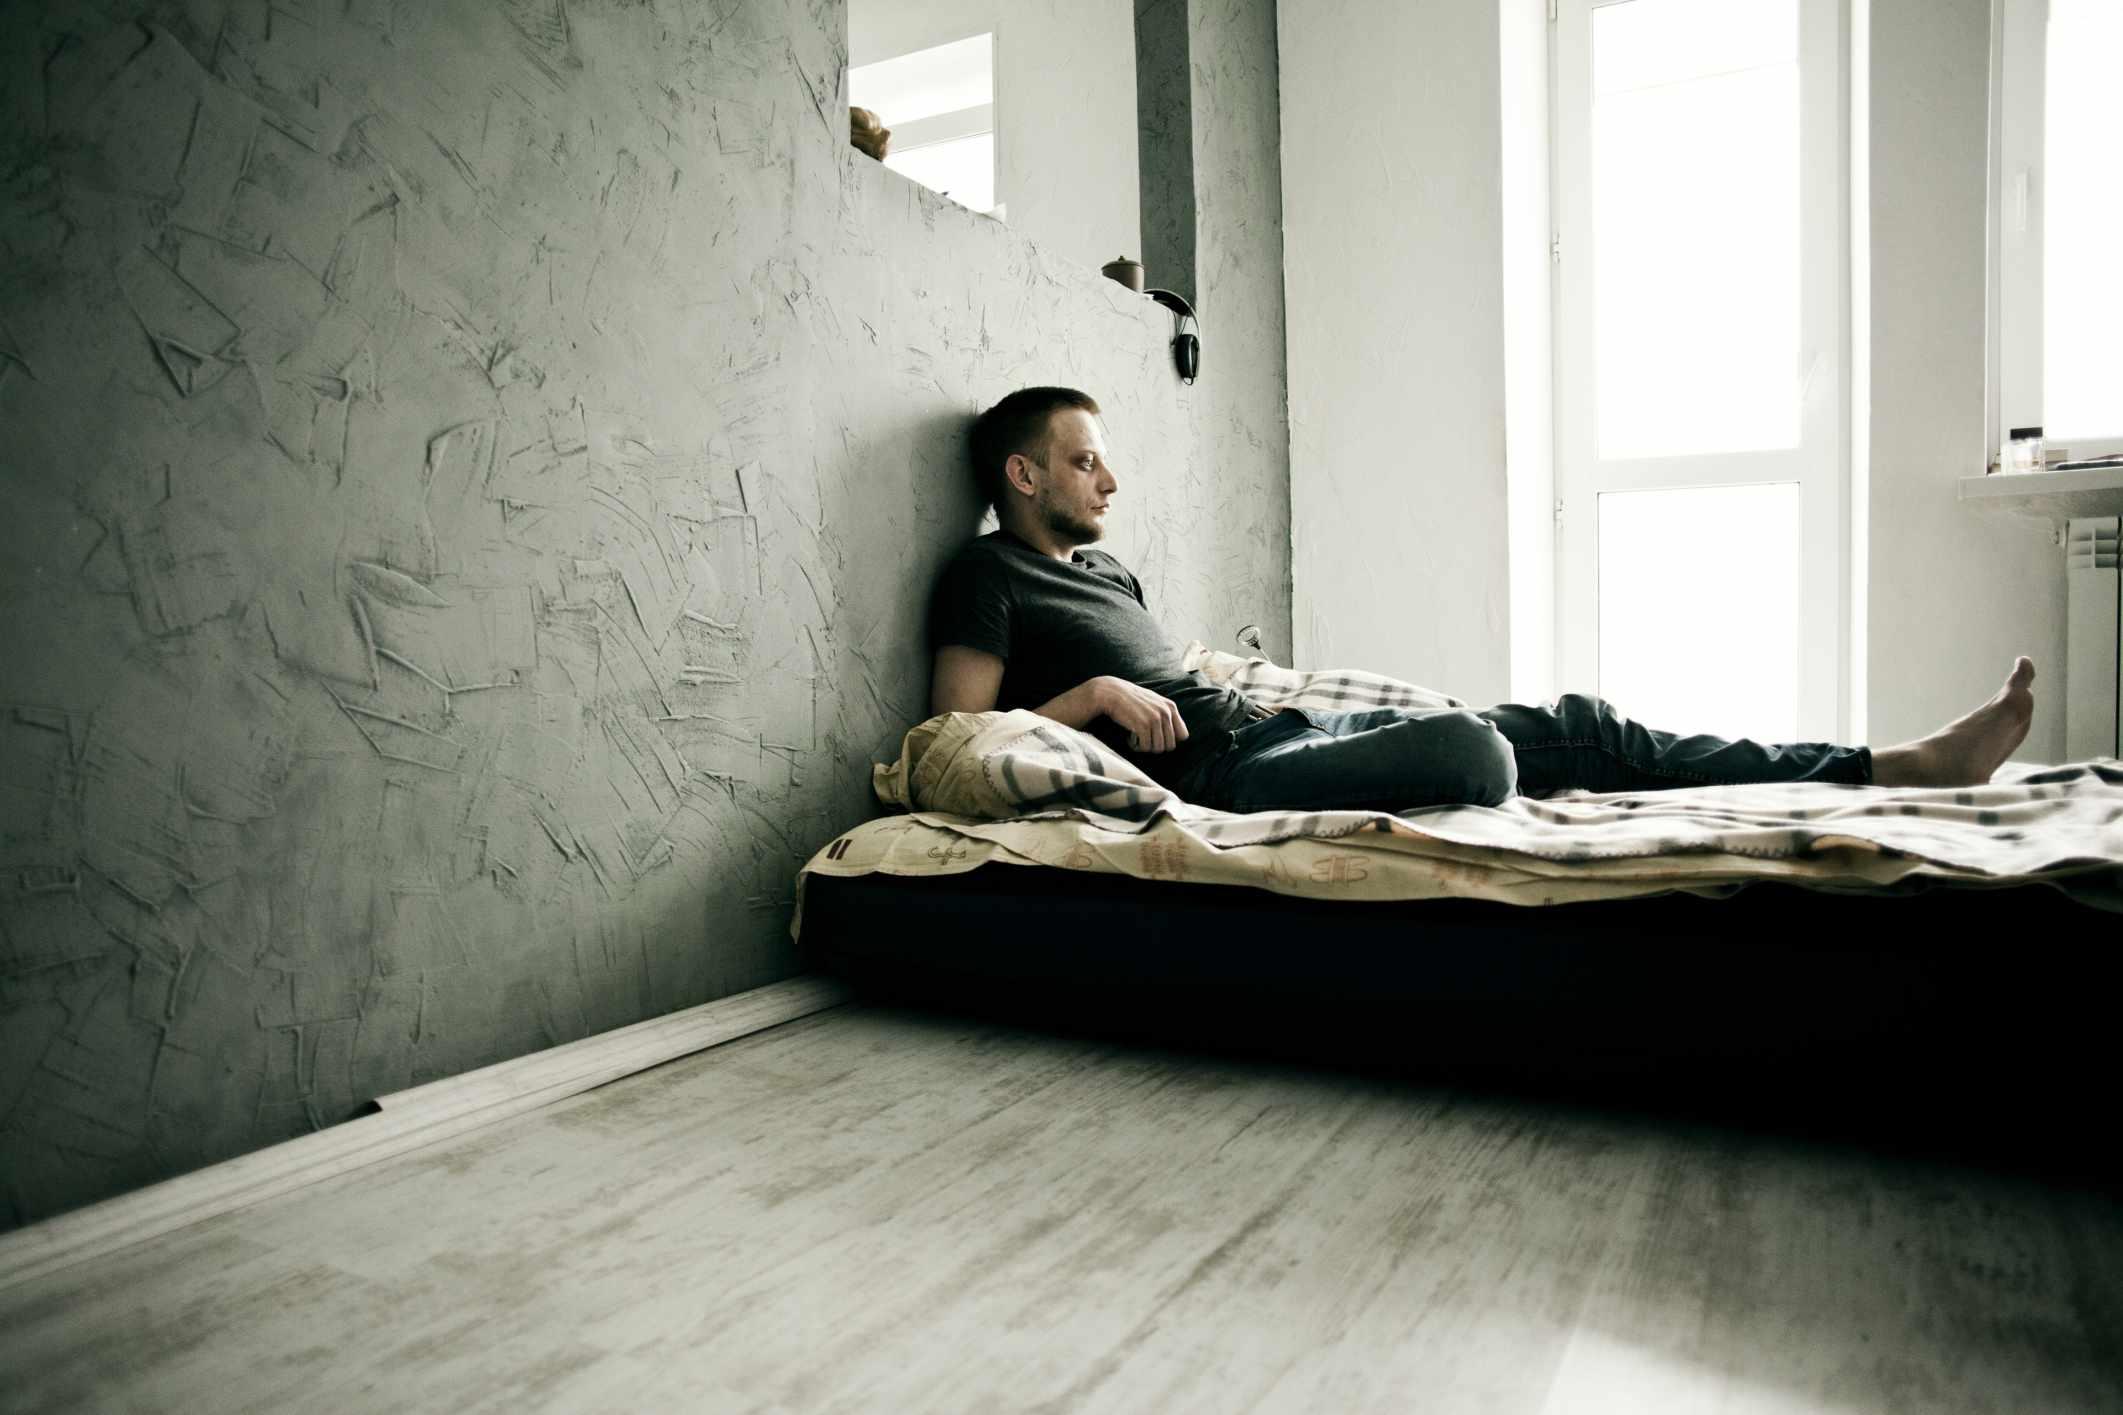 depressed man lying on bed in sparse room